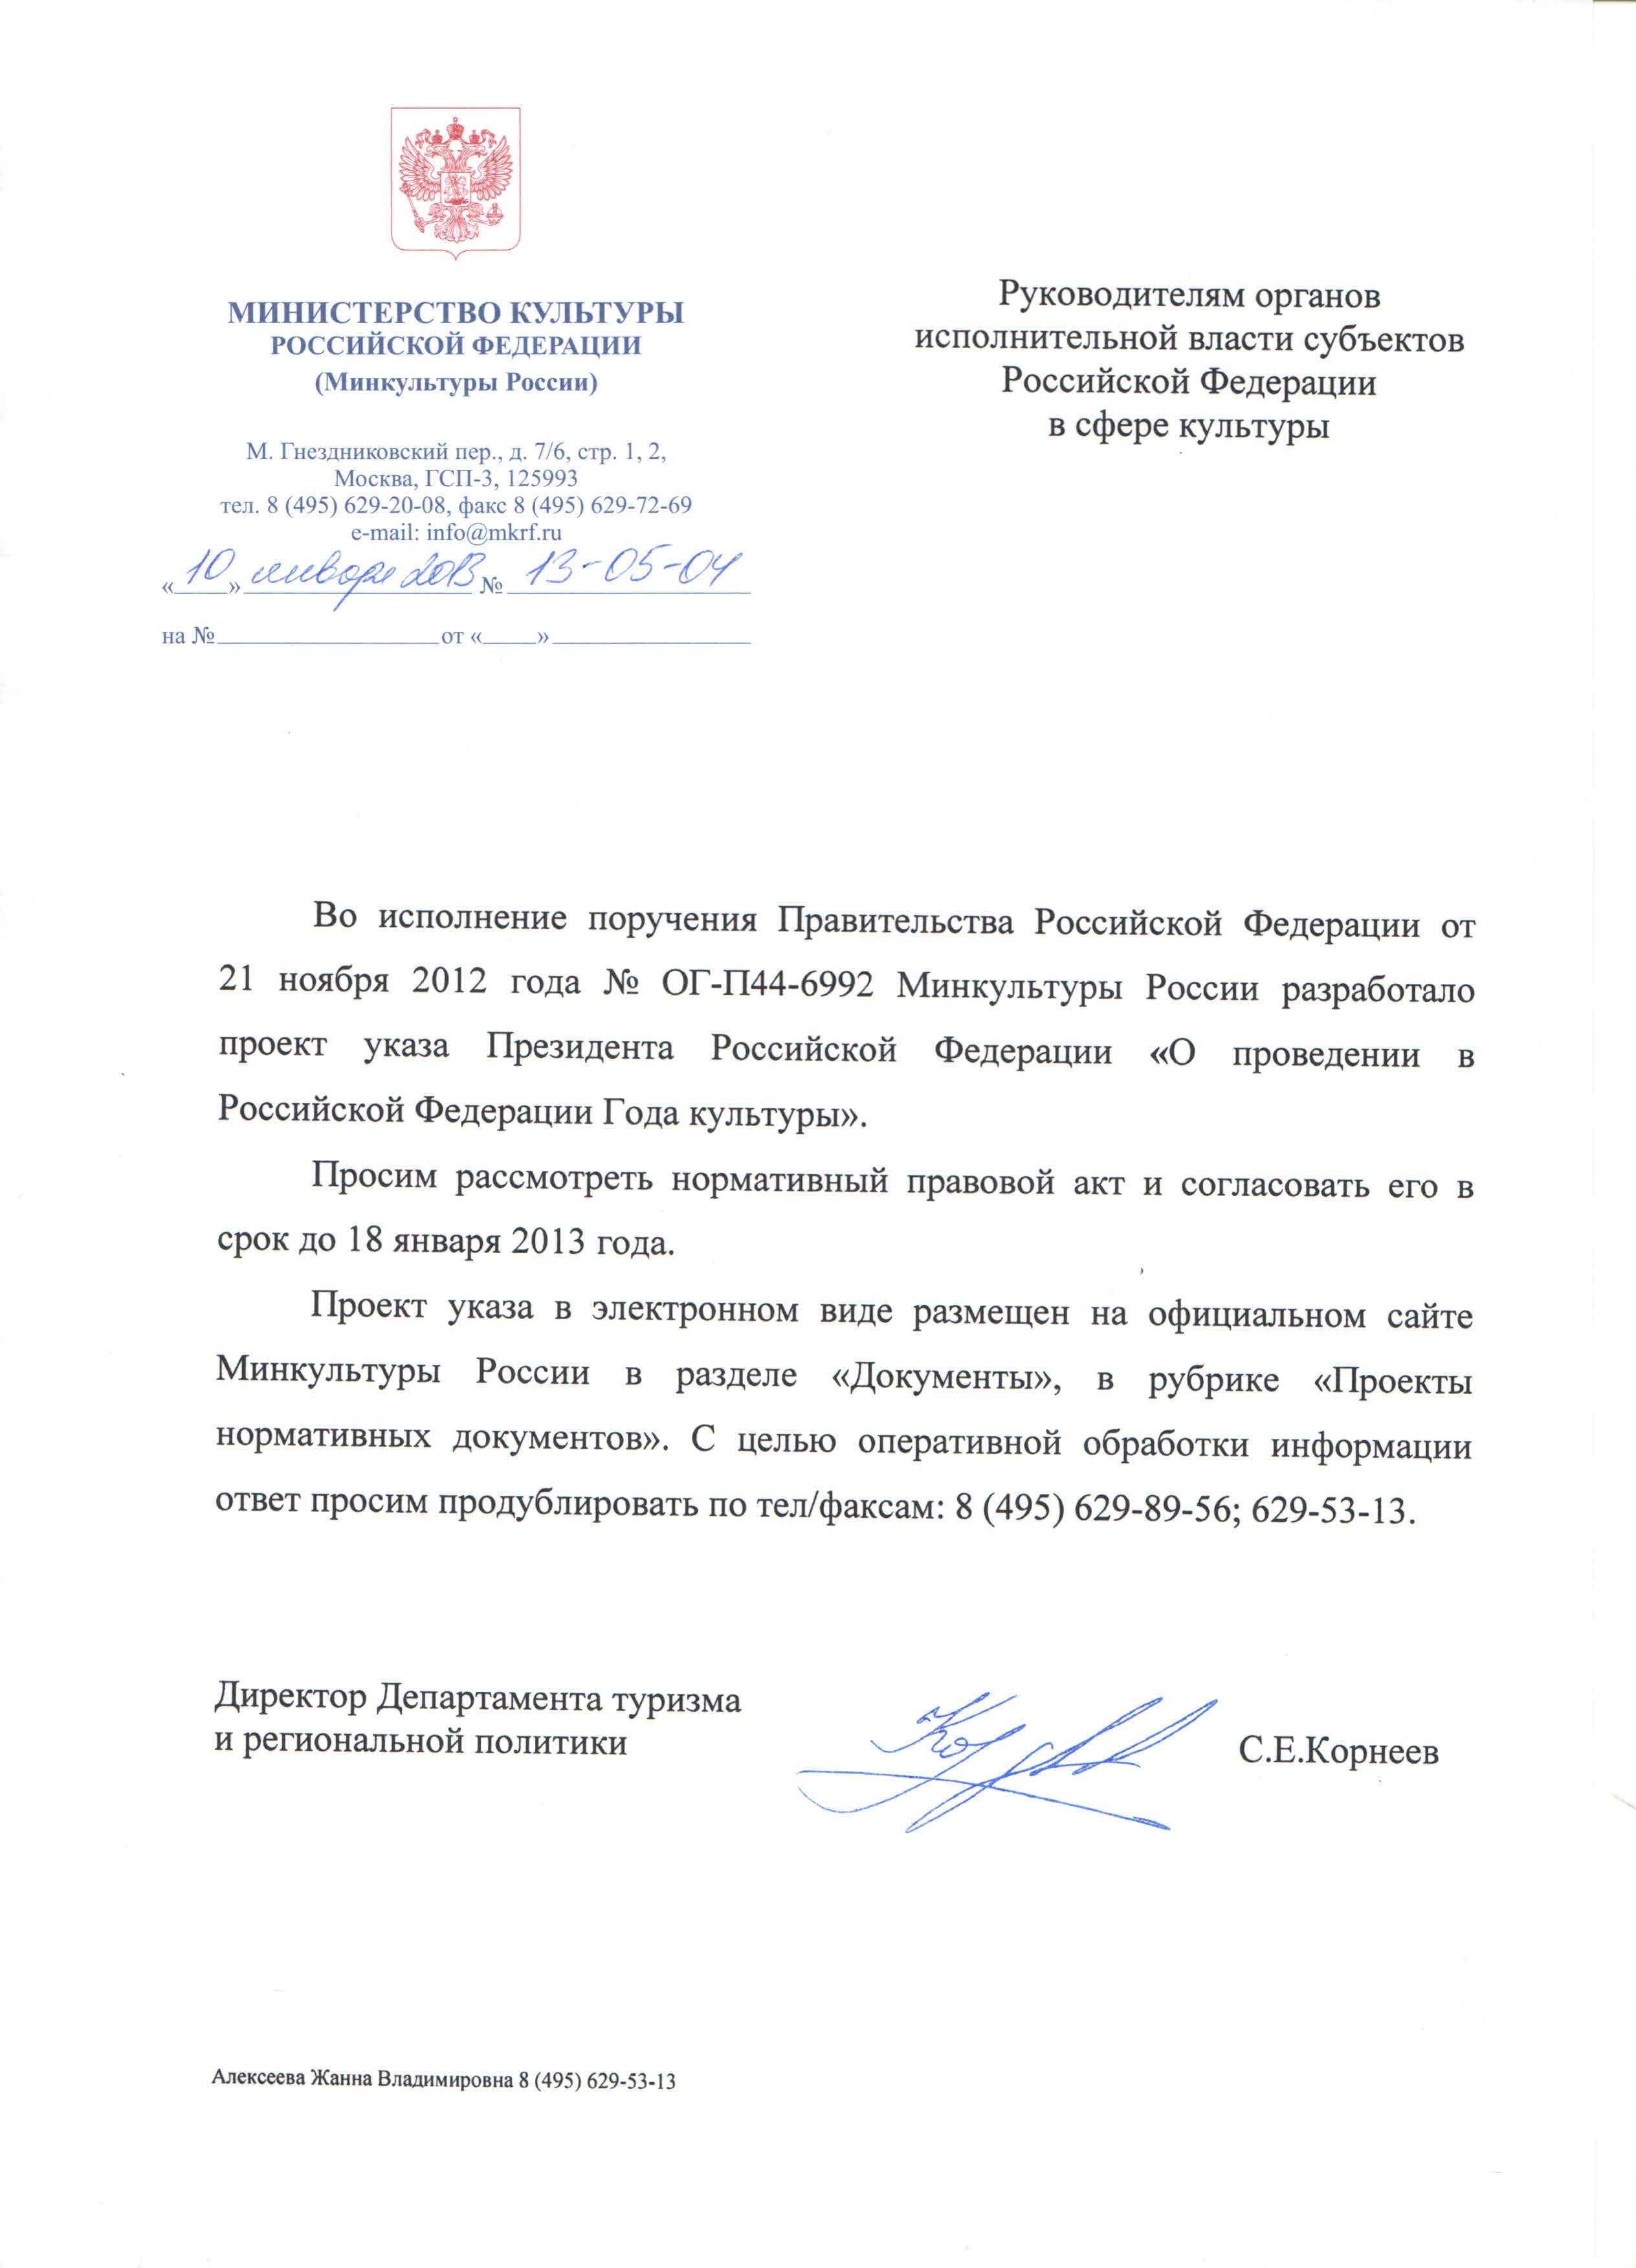 http://s2.uploads.ru/ENSiT.jpg